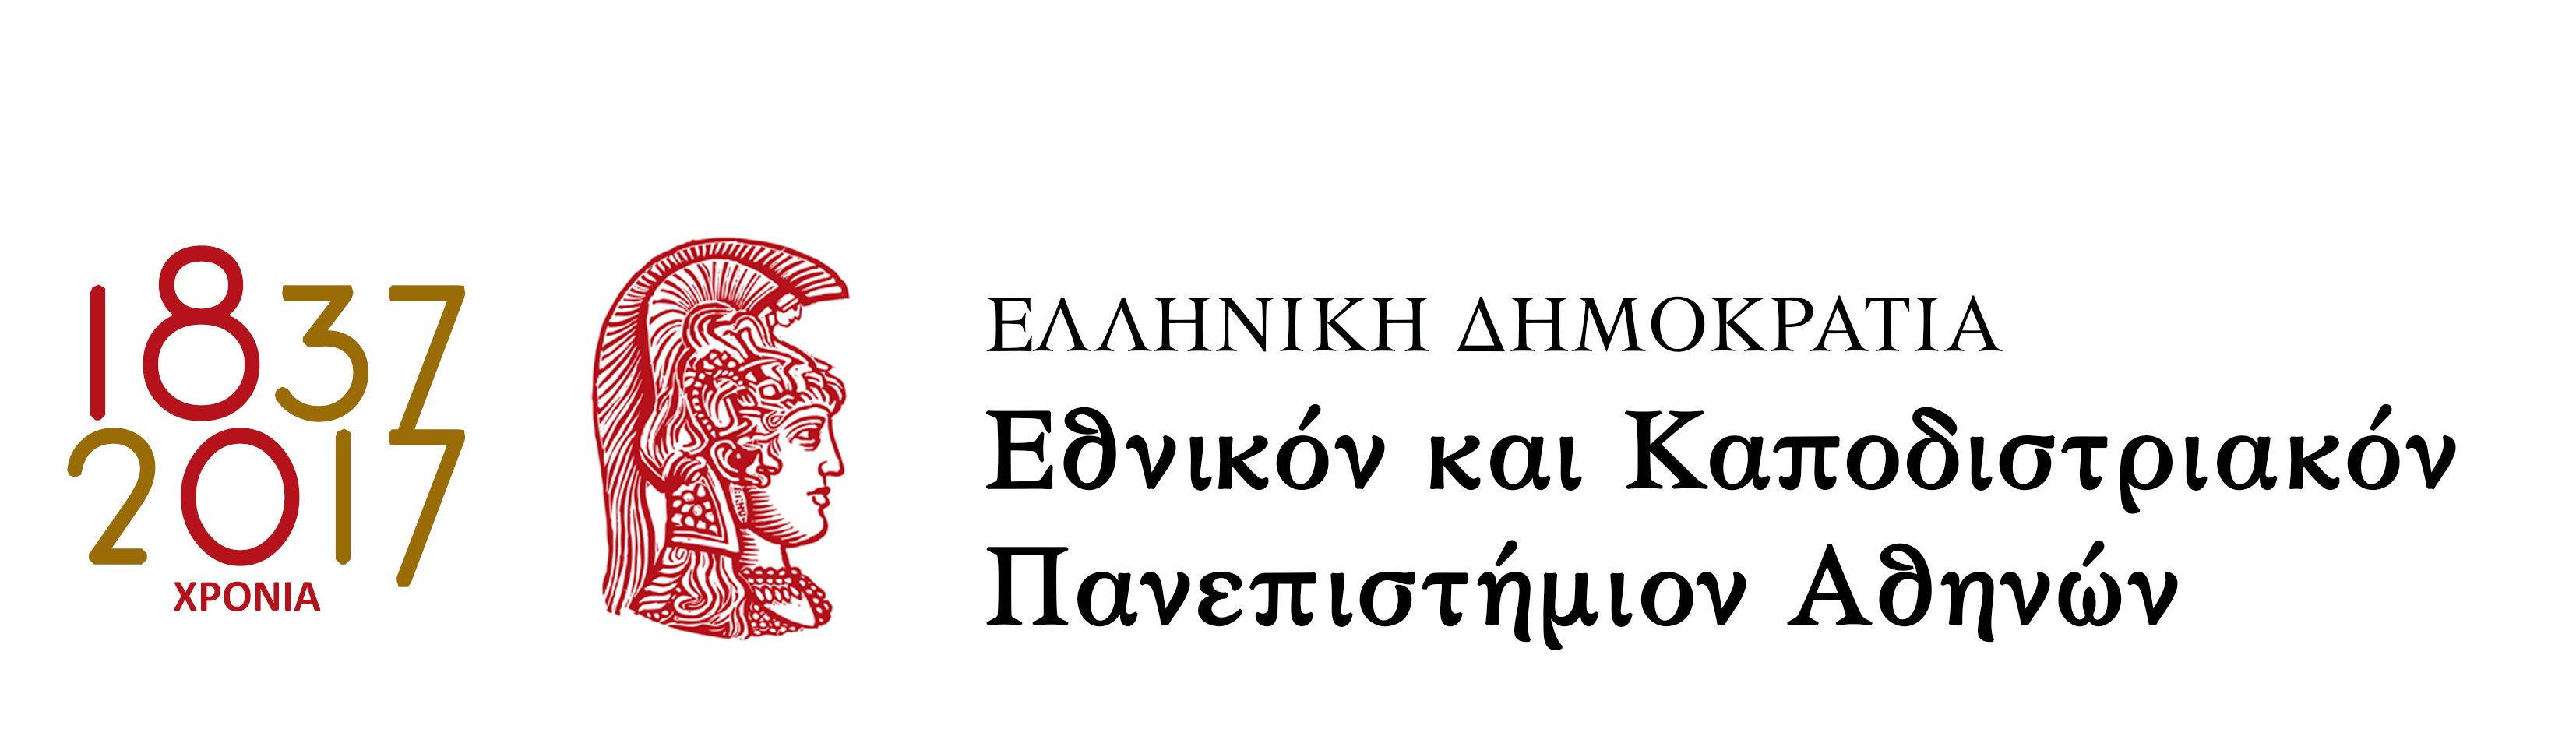 http://share.uoa.gr/public/Documents/logo_UoA_180/LOGOTYPOS_jpg/180-logo-mag%20copy.jpg